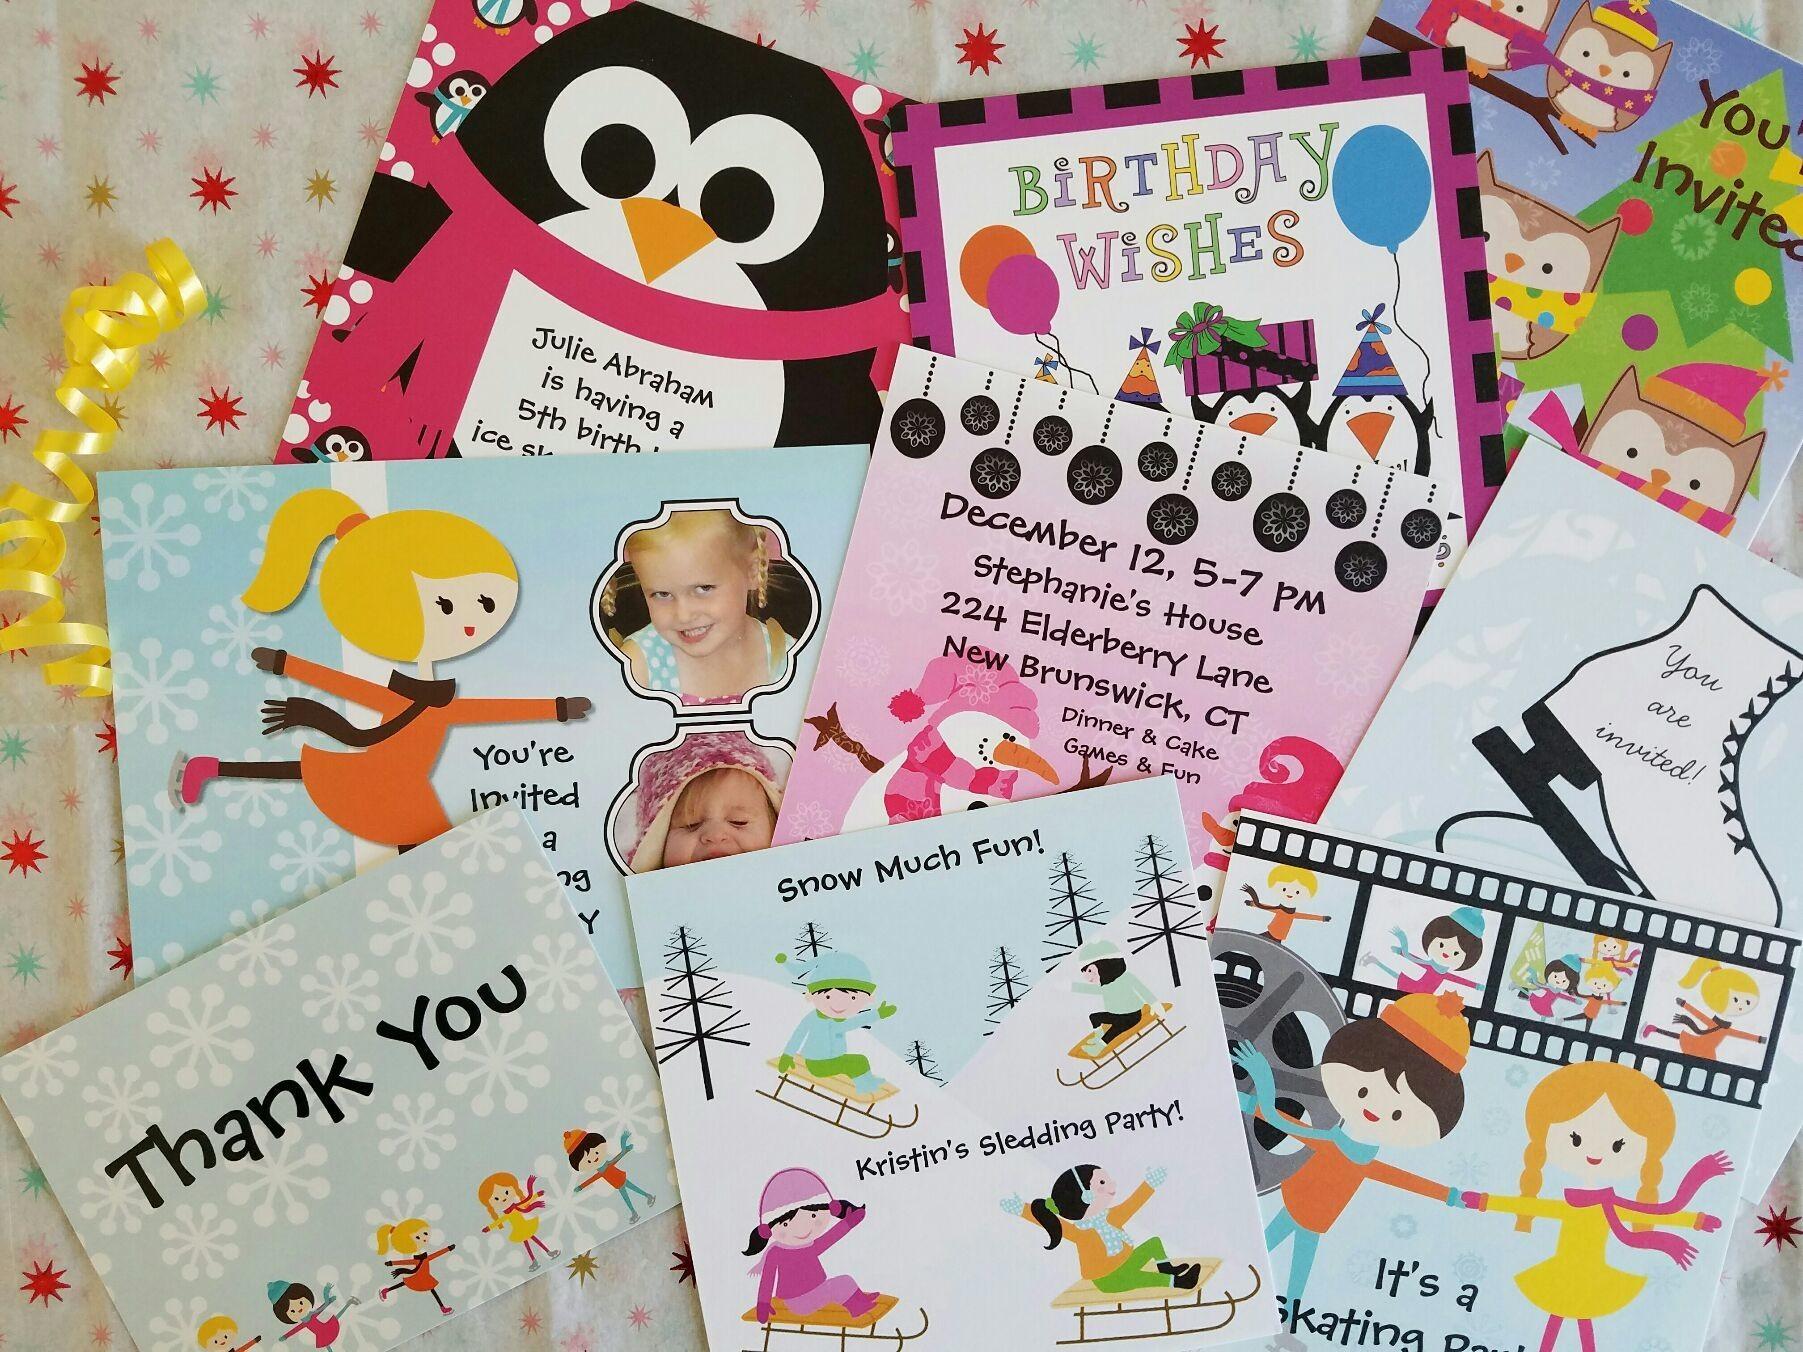 Winter themed kuds birthday invitations for sledding and skating birthday party at www.zazzle.com/kids_birthdays